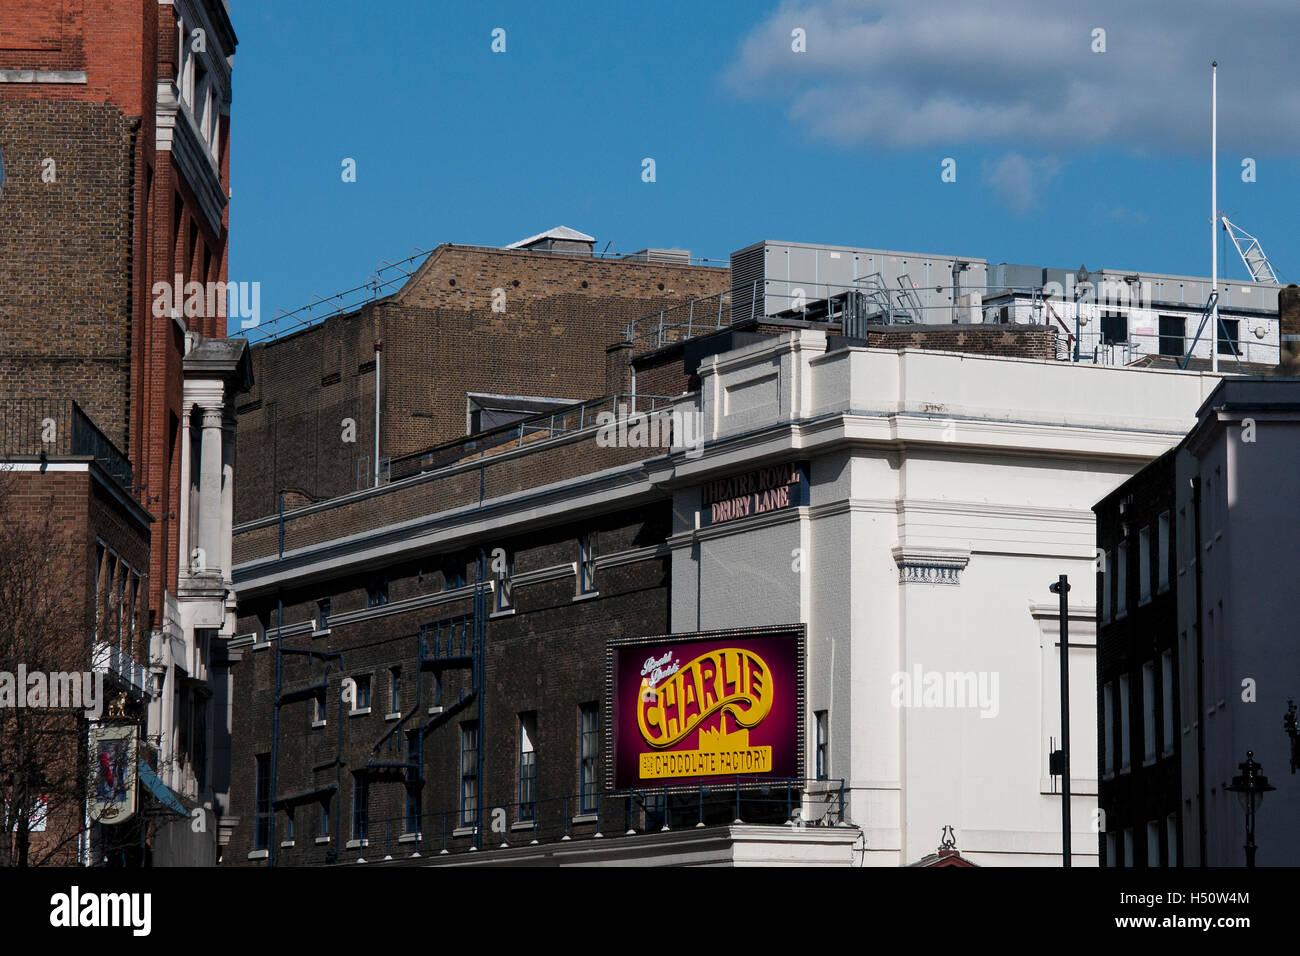 Theatre Royal Drury Lane, London. - Stock Image